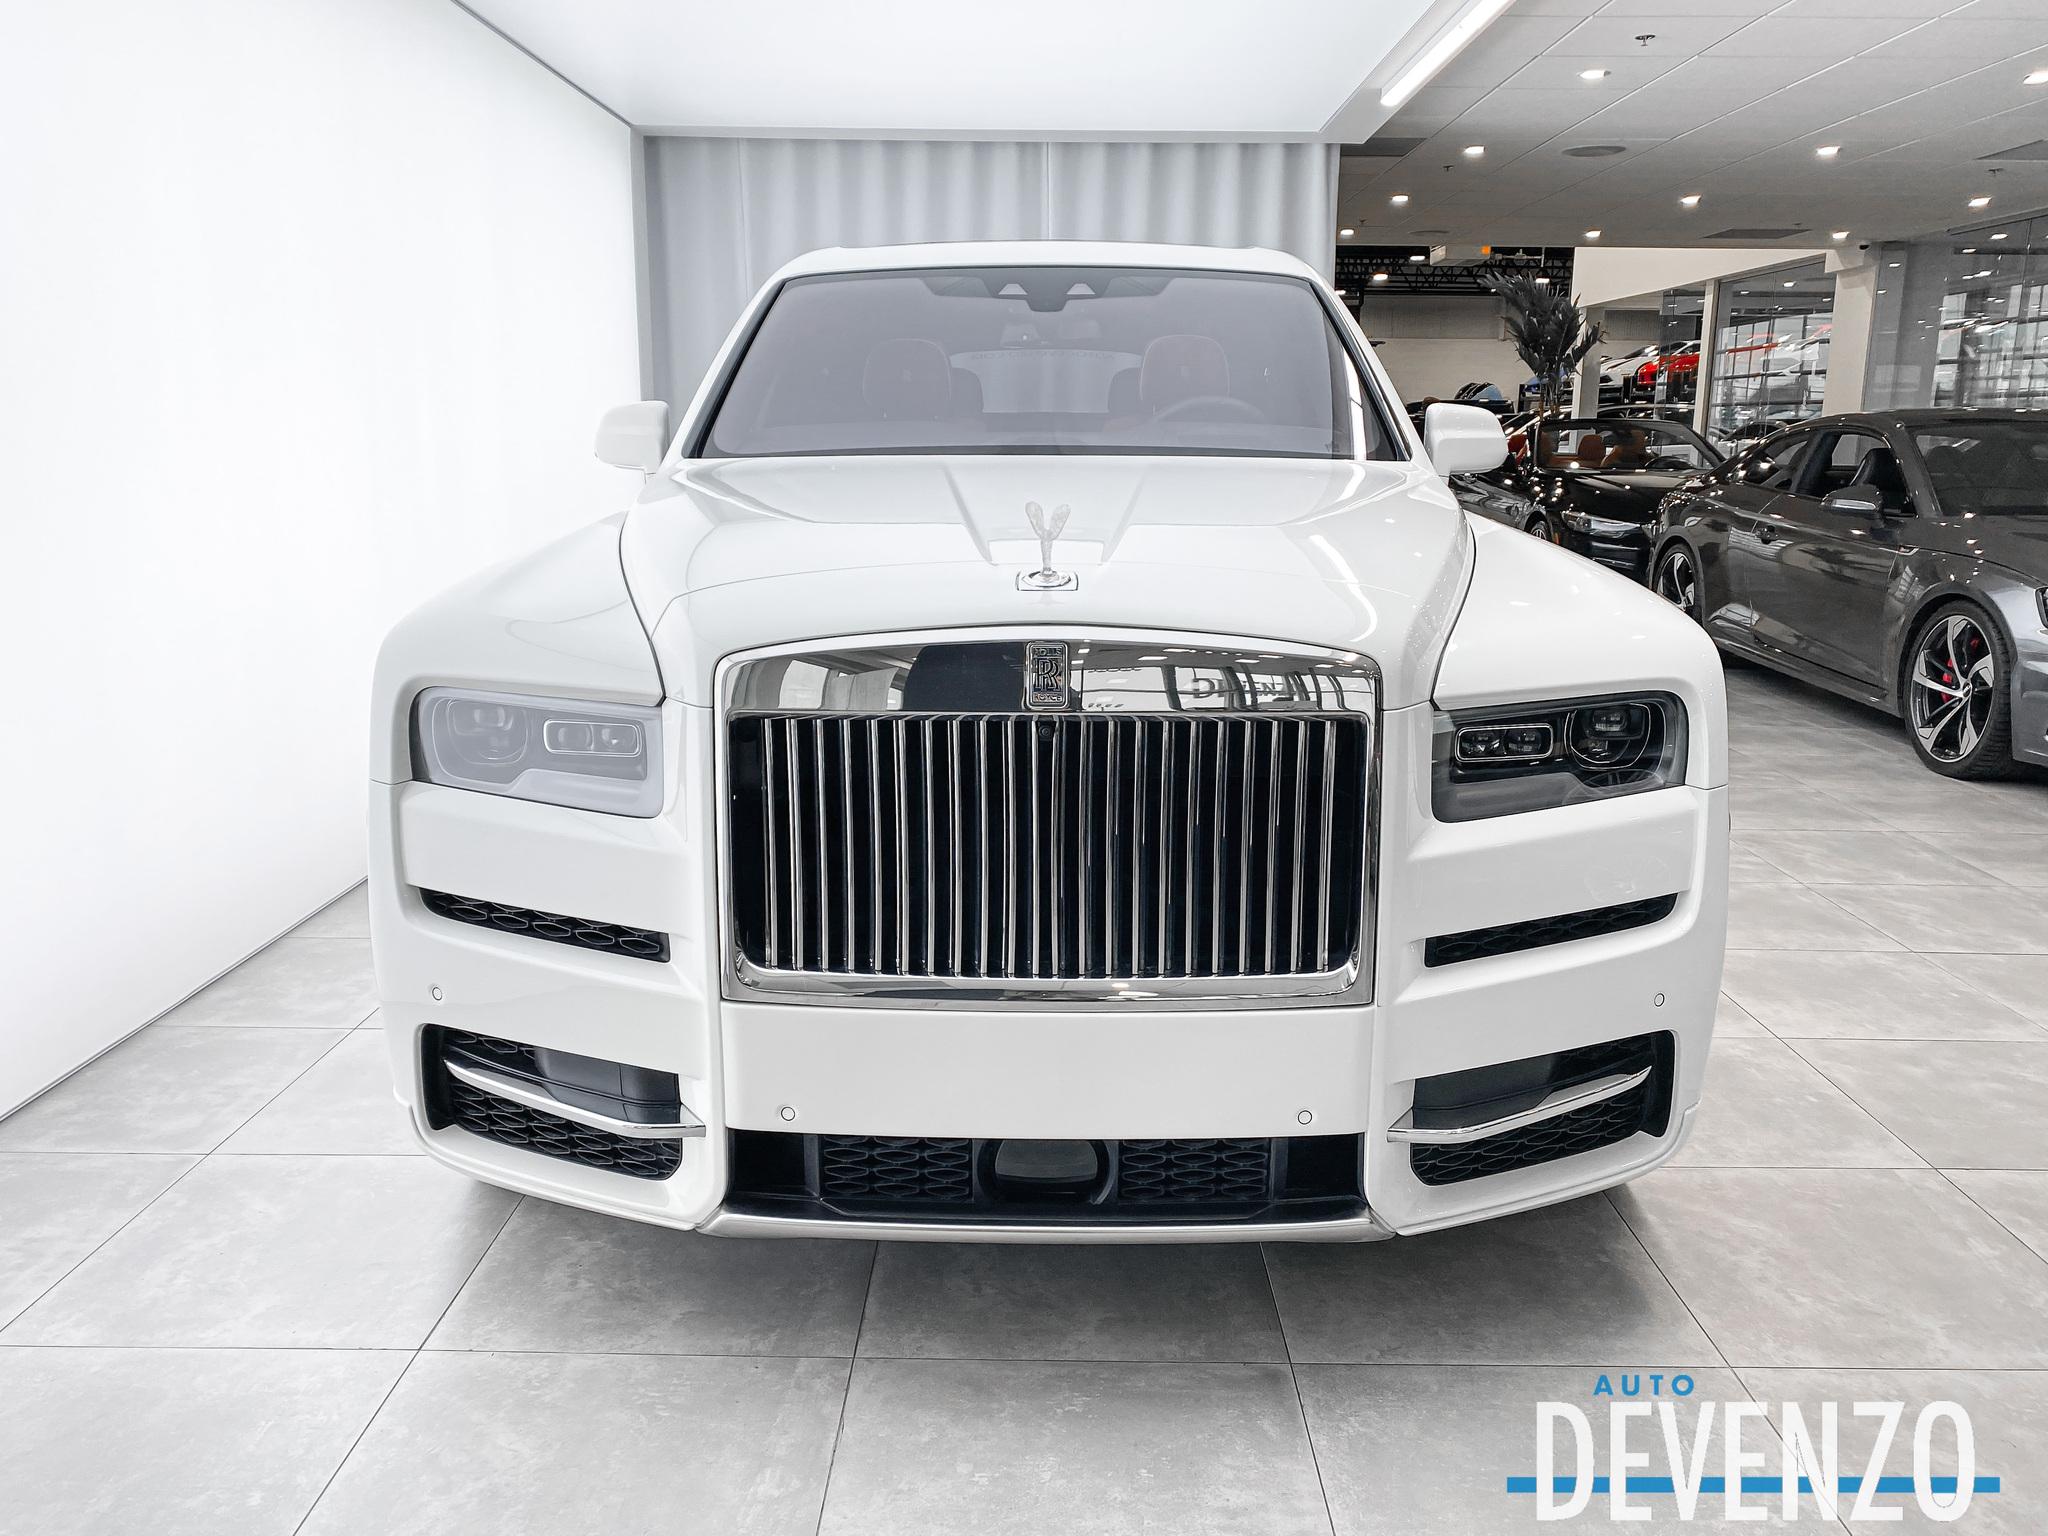 [en_CA]2019 Rolls-Royce Cullinan in St-Eustache, QC[/en_CA][fr_CA]2019 Rolls-Royce Cullinan dans St-Eustache, QC[/fr_CA] – SLA689X52KU114111 complet